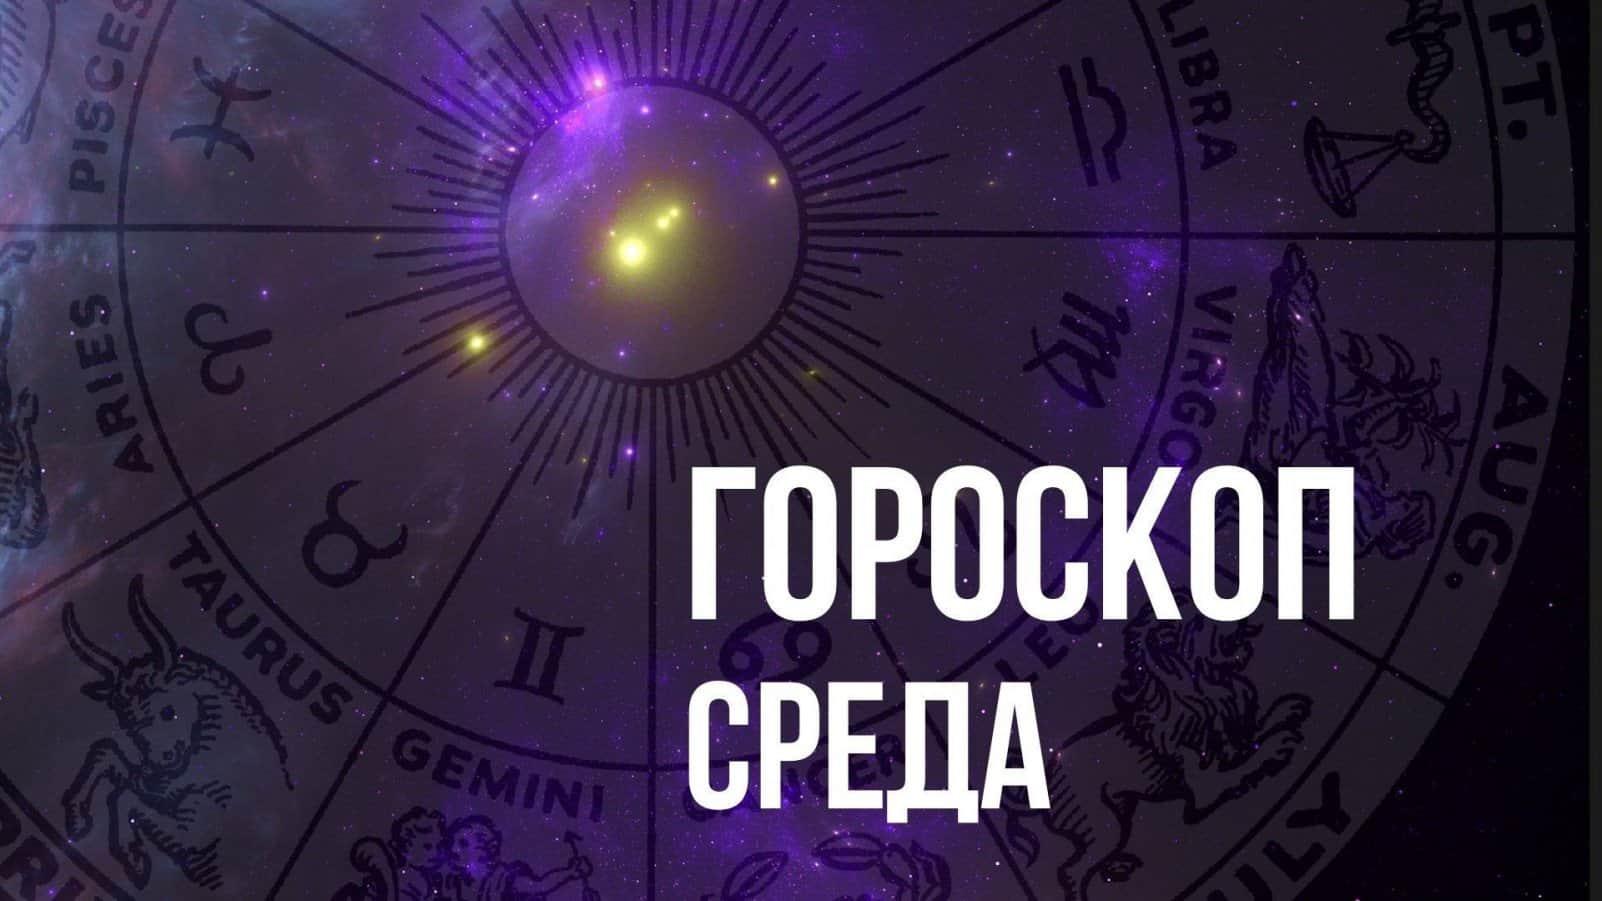 Гороскоп на среду 24 марта для каждого знака Зодиака